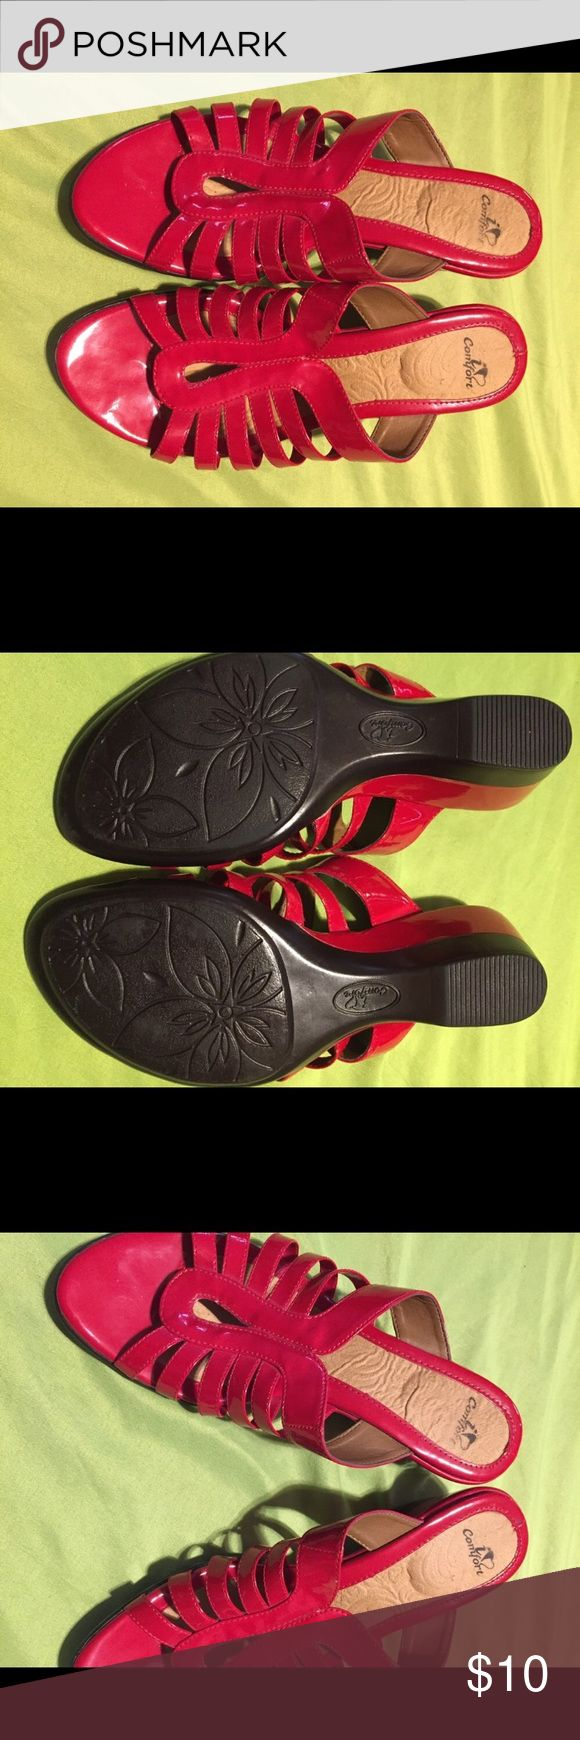 NWOT! Made by I love comfort. Size 7.5 medium NWOT. Made by I love comfort. Red sandals with comfy foot bed. Size 7.5 medium width i love comfort Shoes Sandals